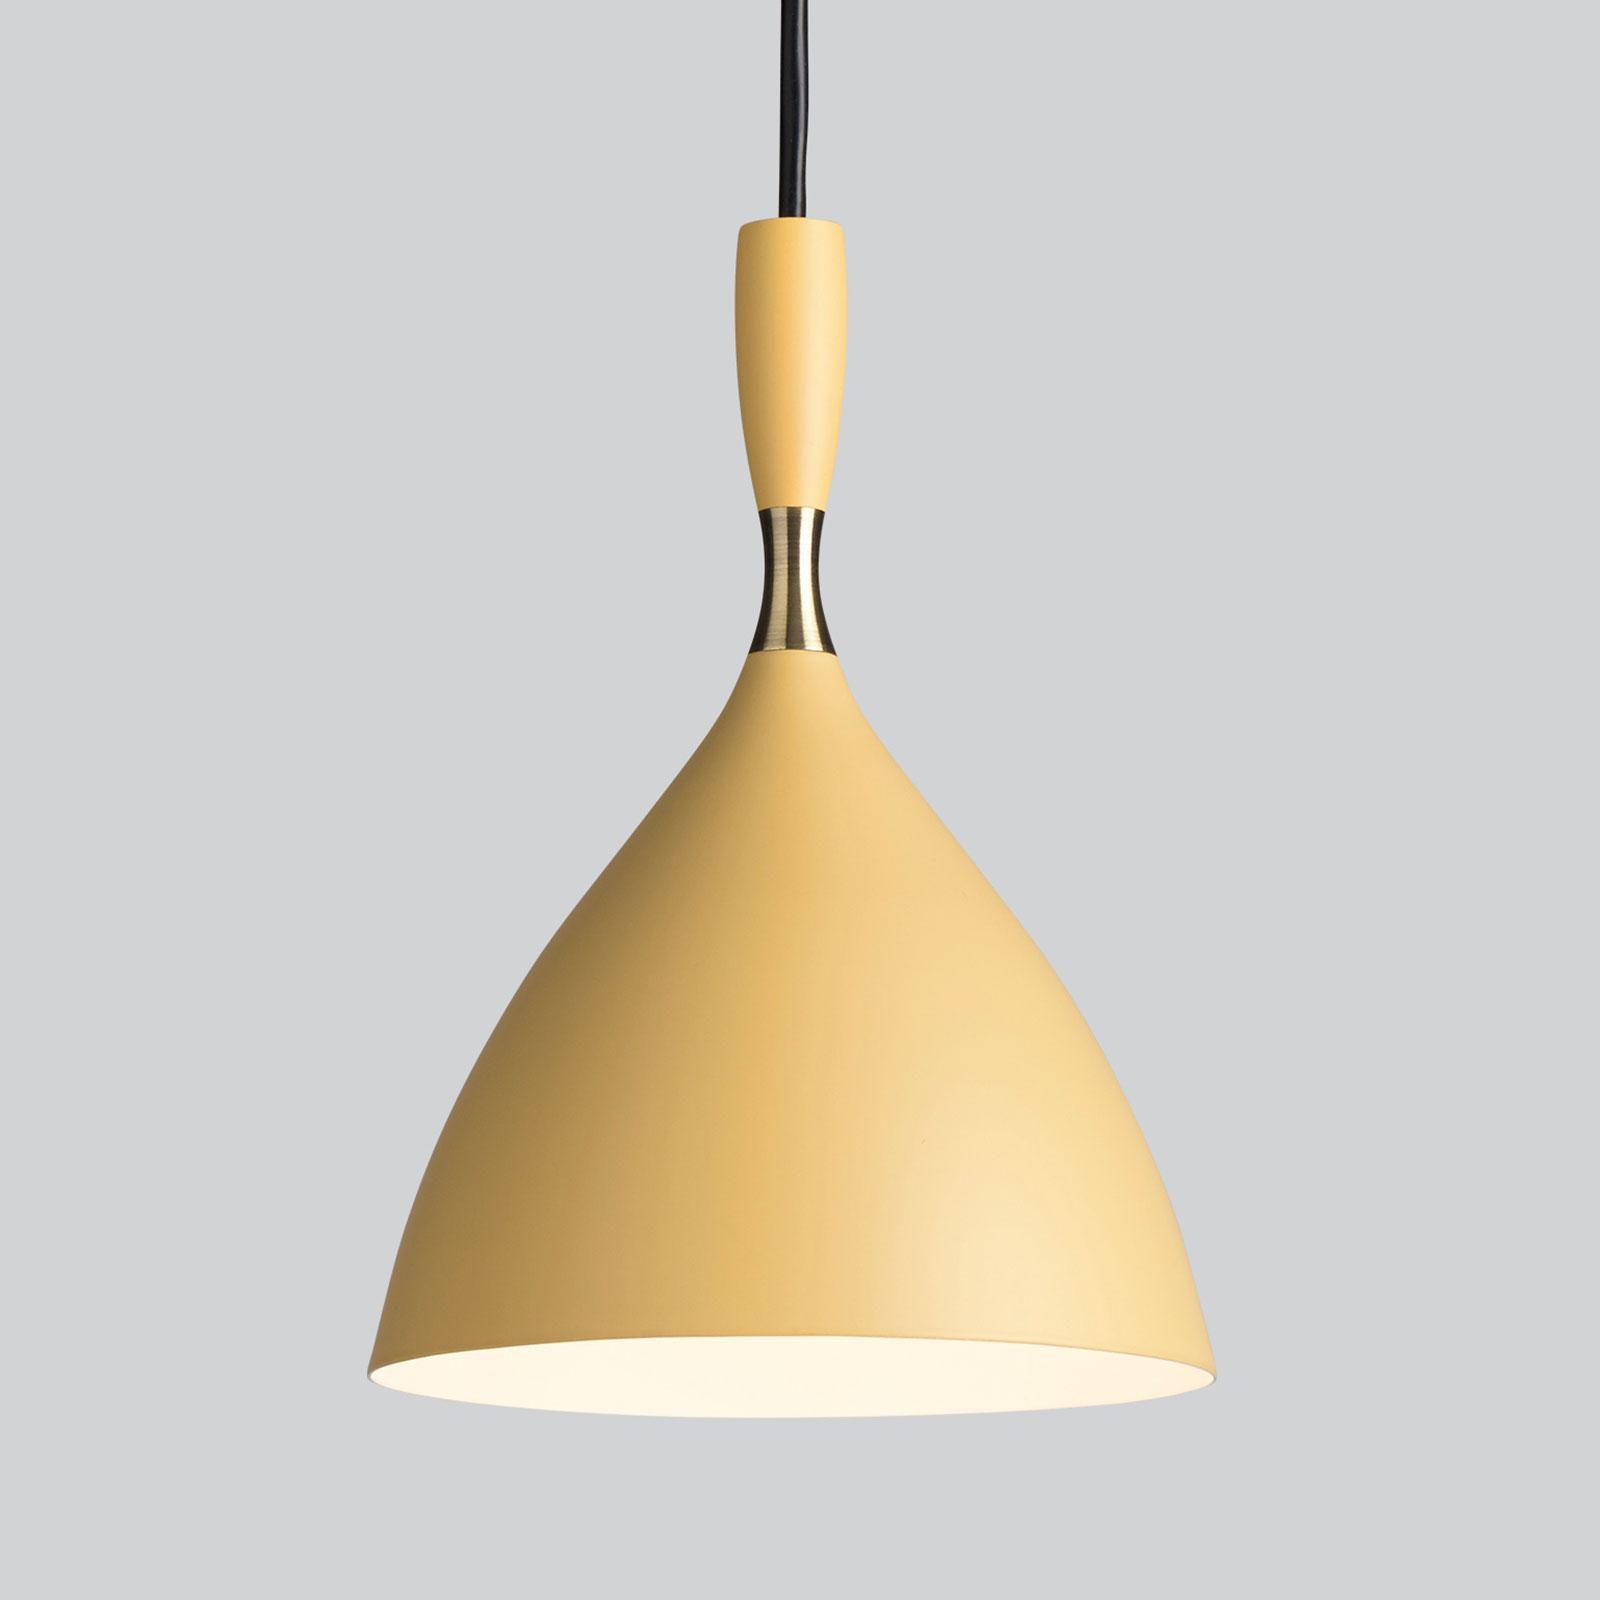 Northern lampa wisząca Dokka jasnożółta